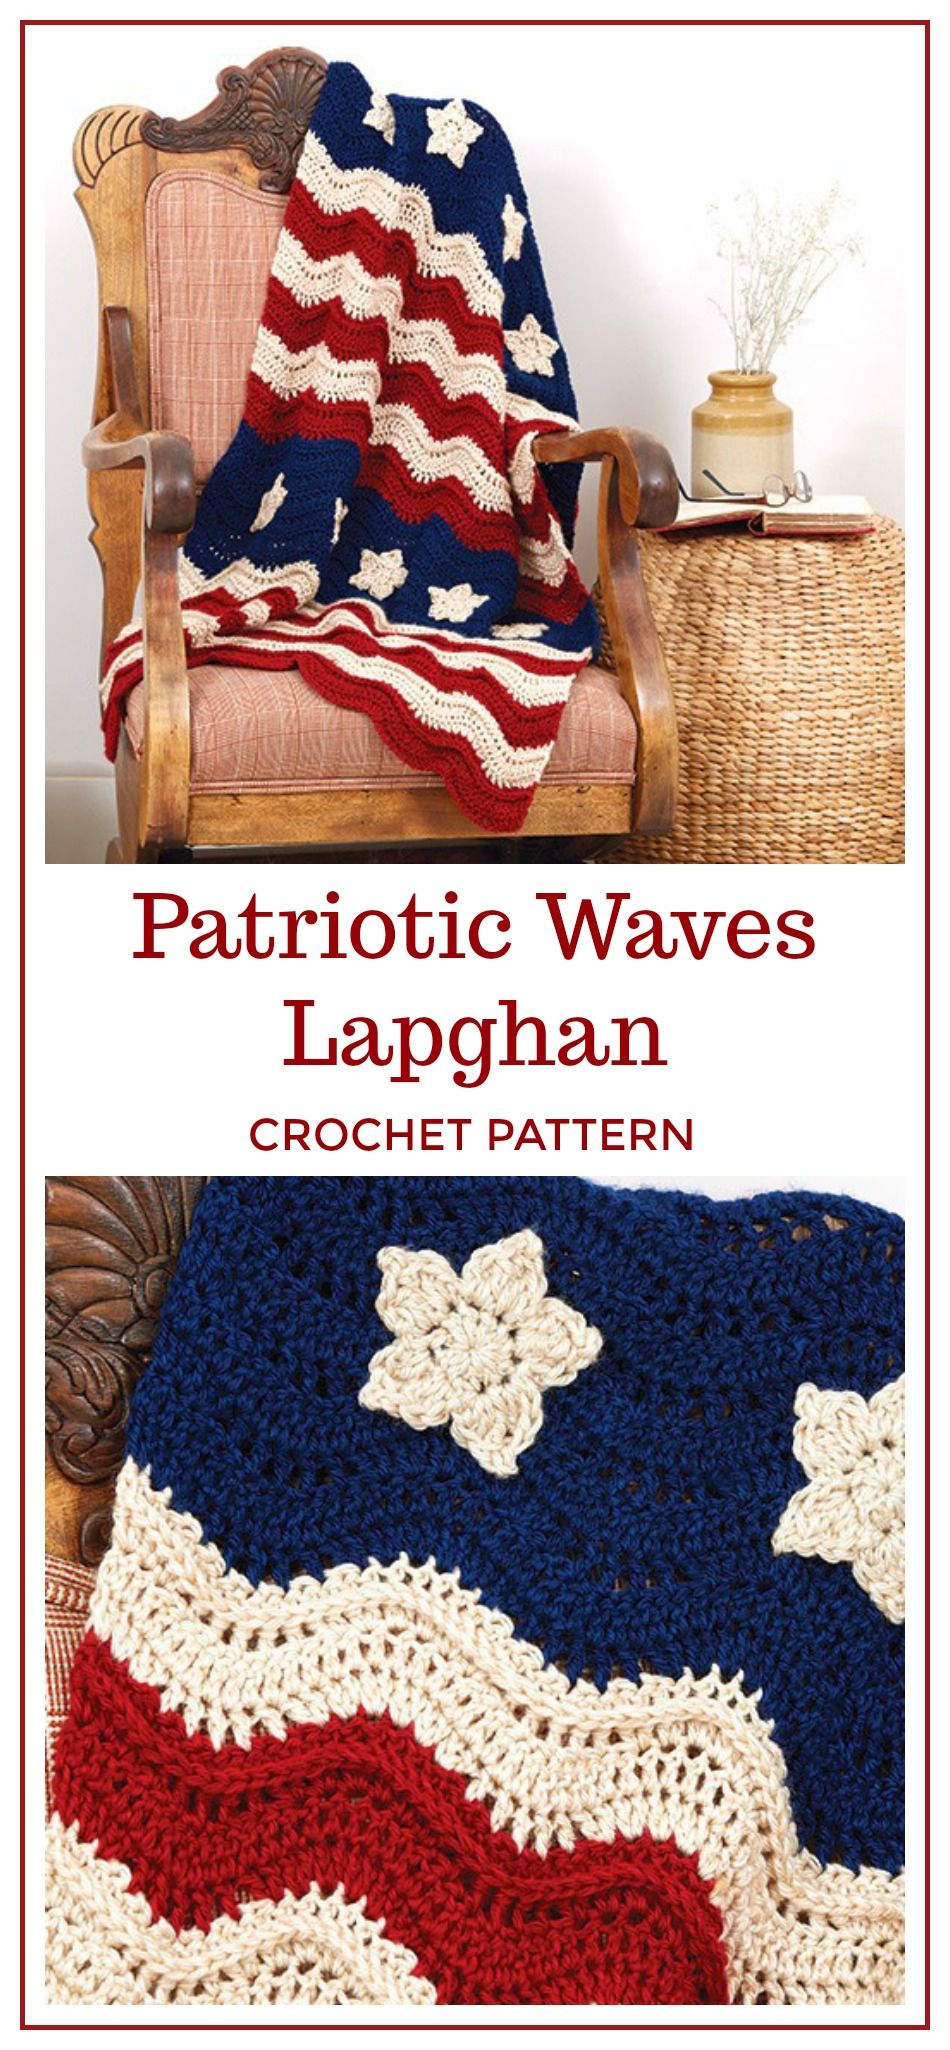 Patriotic Waves Lapghan Crochet Pattern Download Crochet Old Glory